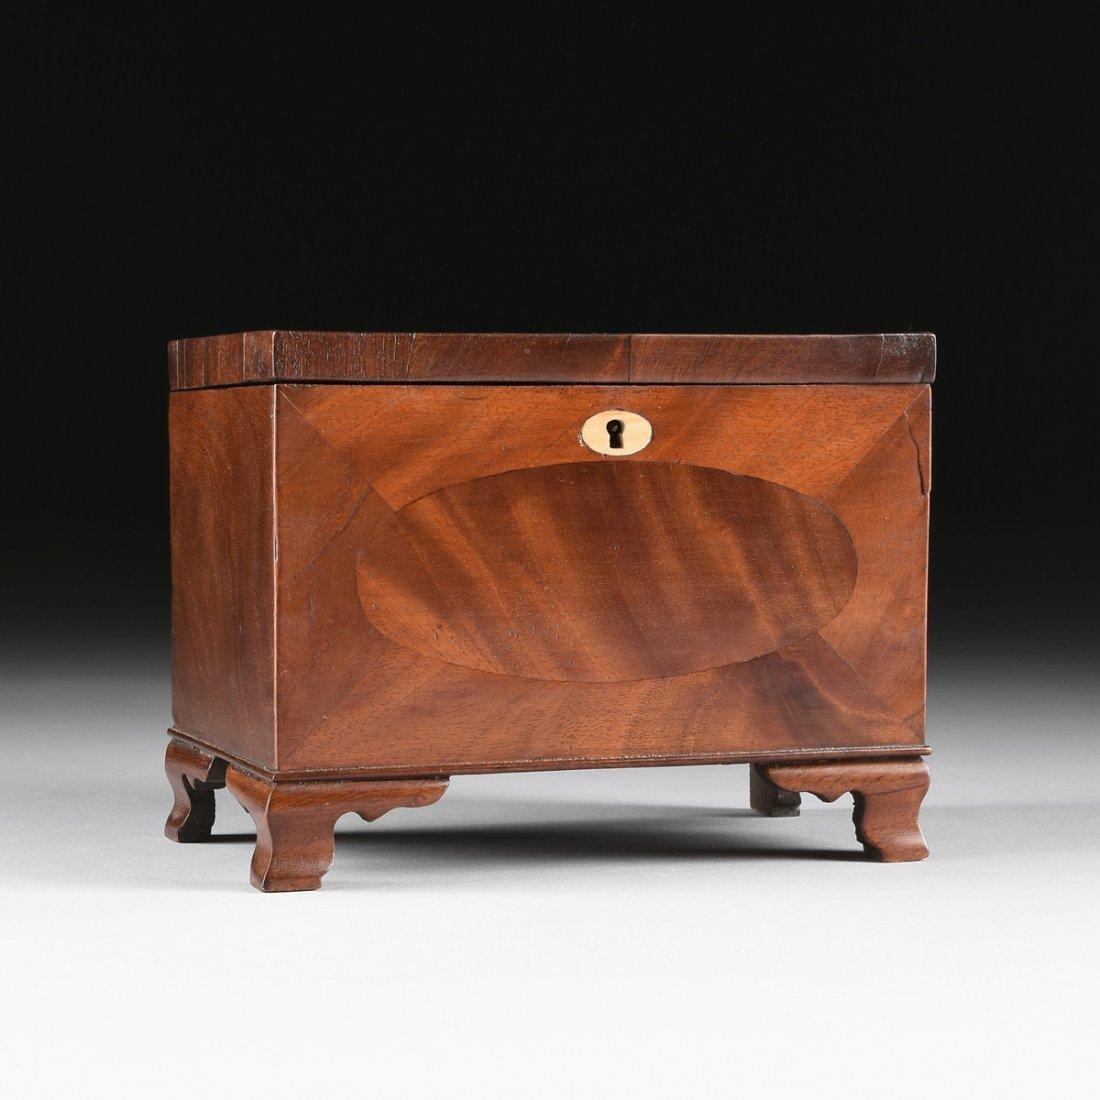 A FEDERAL MAHOGANY PARQUETRY KEEPSAKE BOX, DATED 1824,